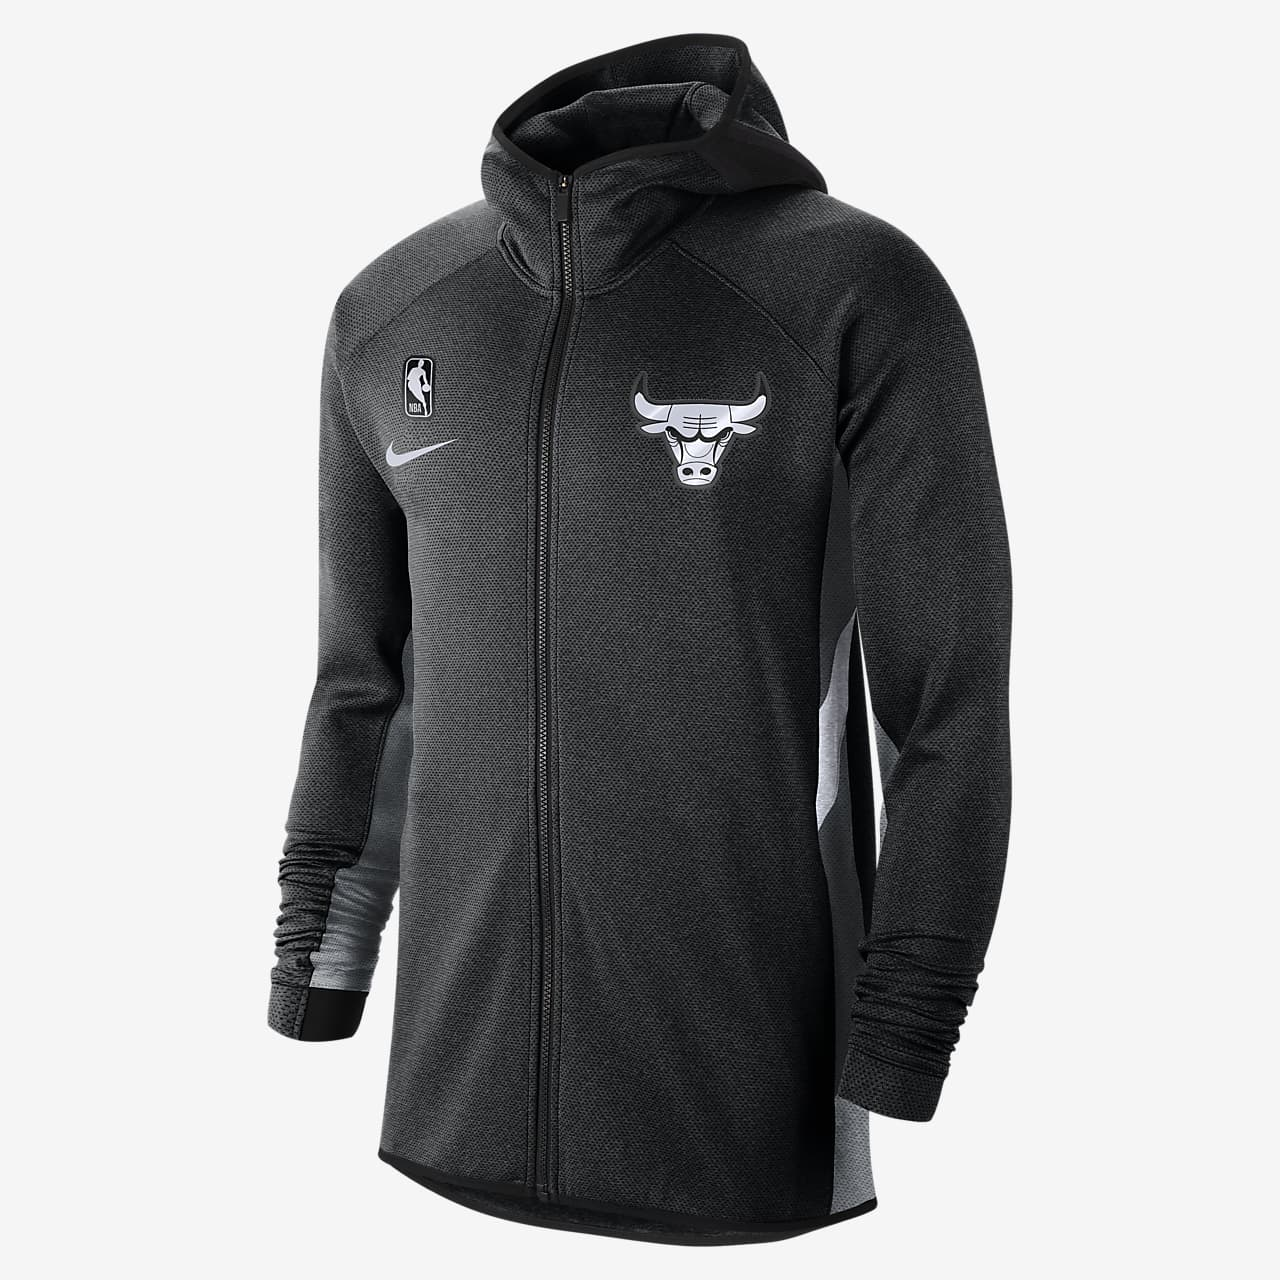 Bulls Nike Therma Flex Showtime Men's NBA Hoodie